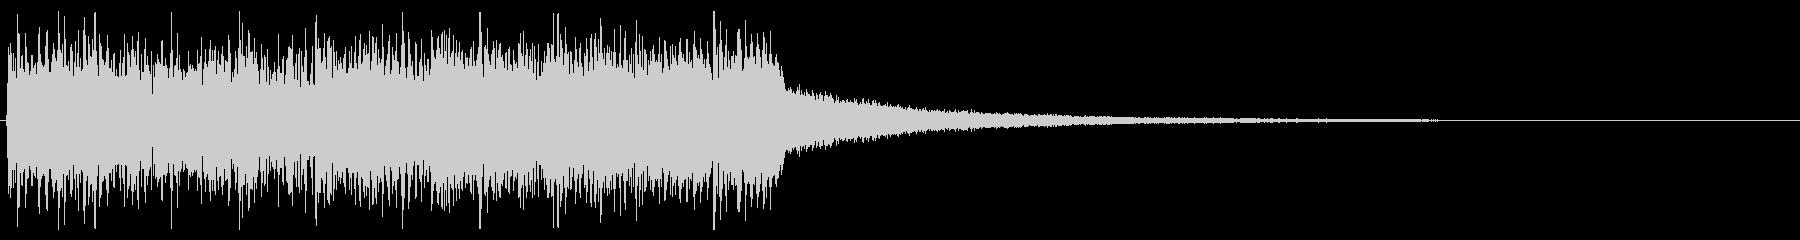 KANTロックバンド決めジングルの未再生の波形